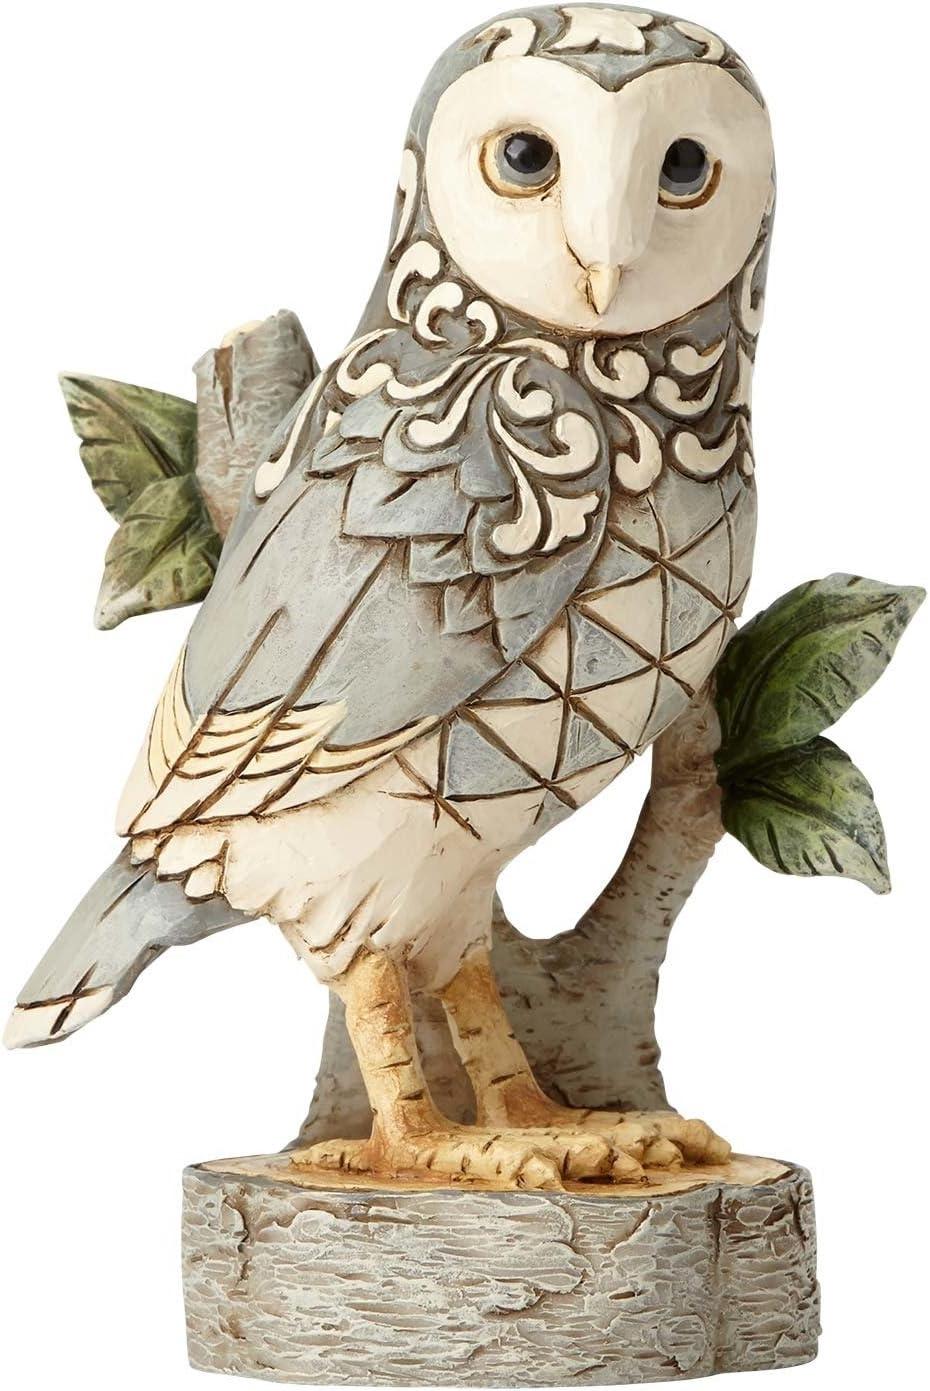 "Enesco 4056970 Jim Shore Heartwood Creek White Woodland Owl On Branch Stone Resin Figurine, 4.49"", Grey"